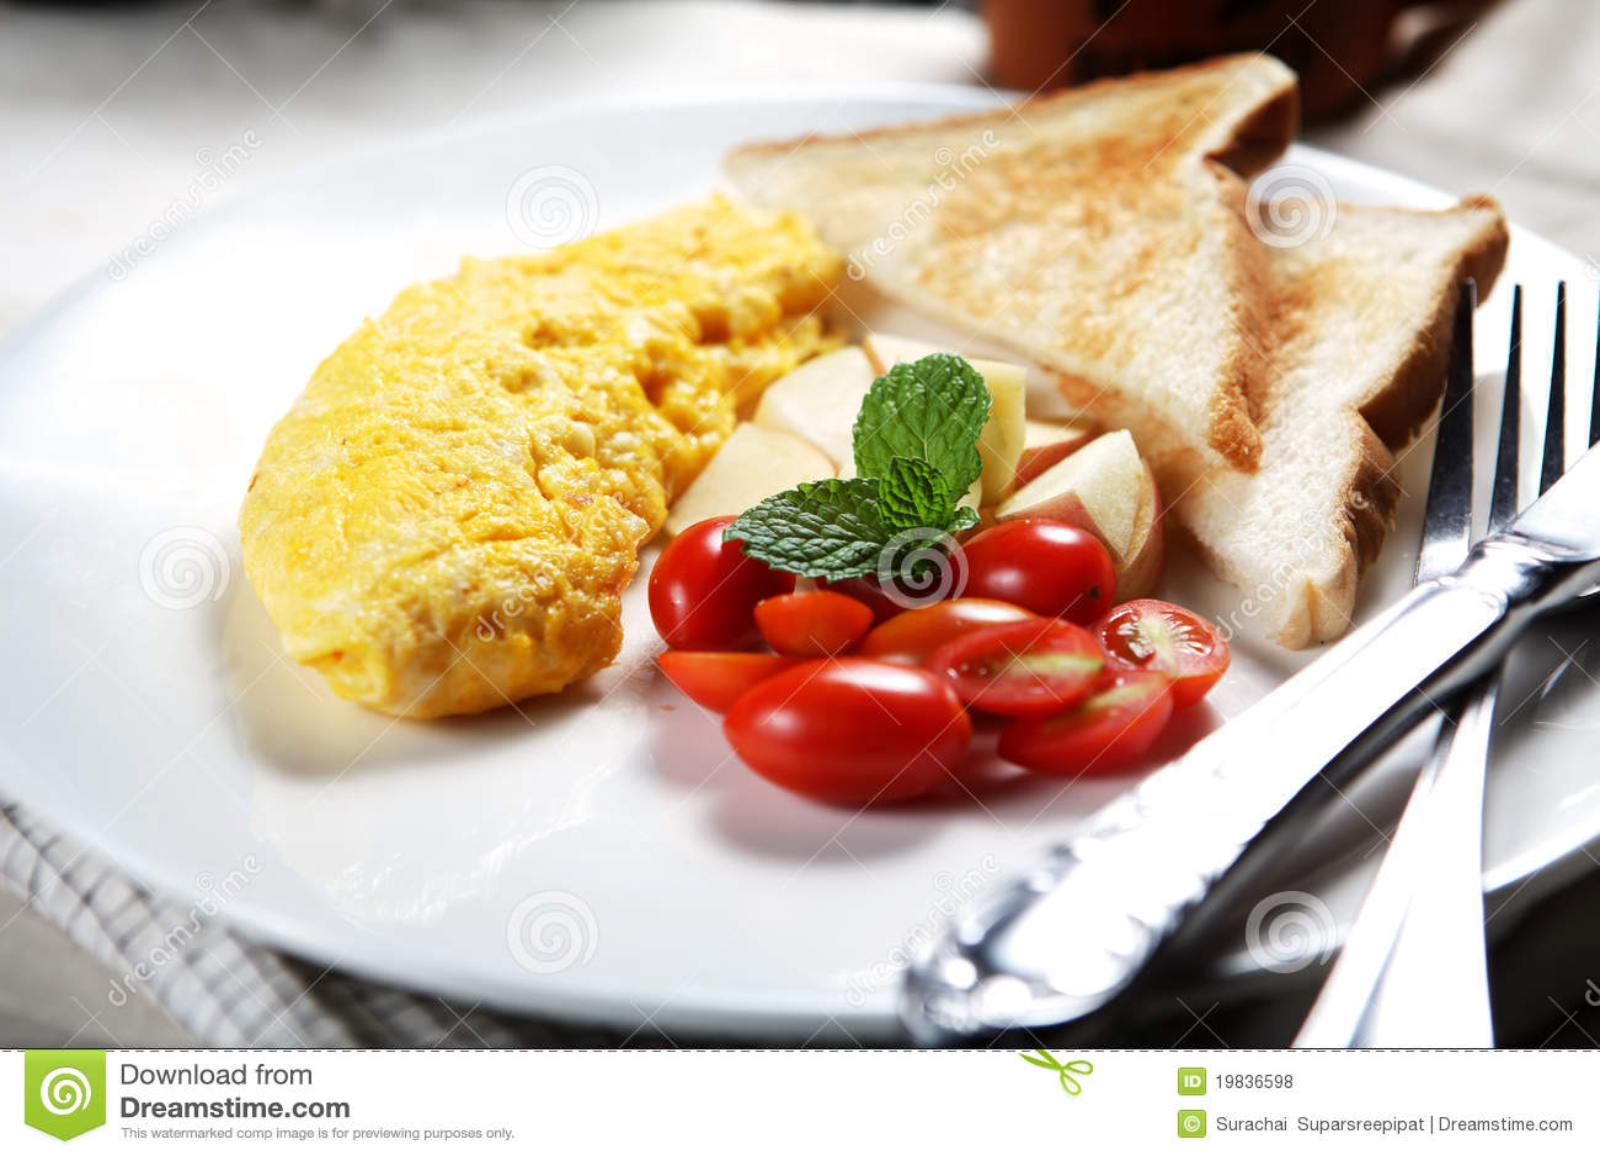 Low fat healthy snacks uk